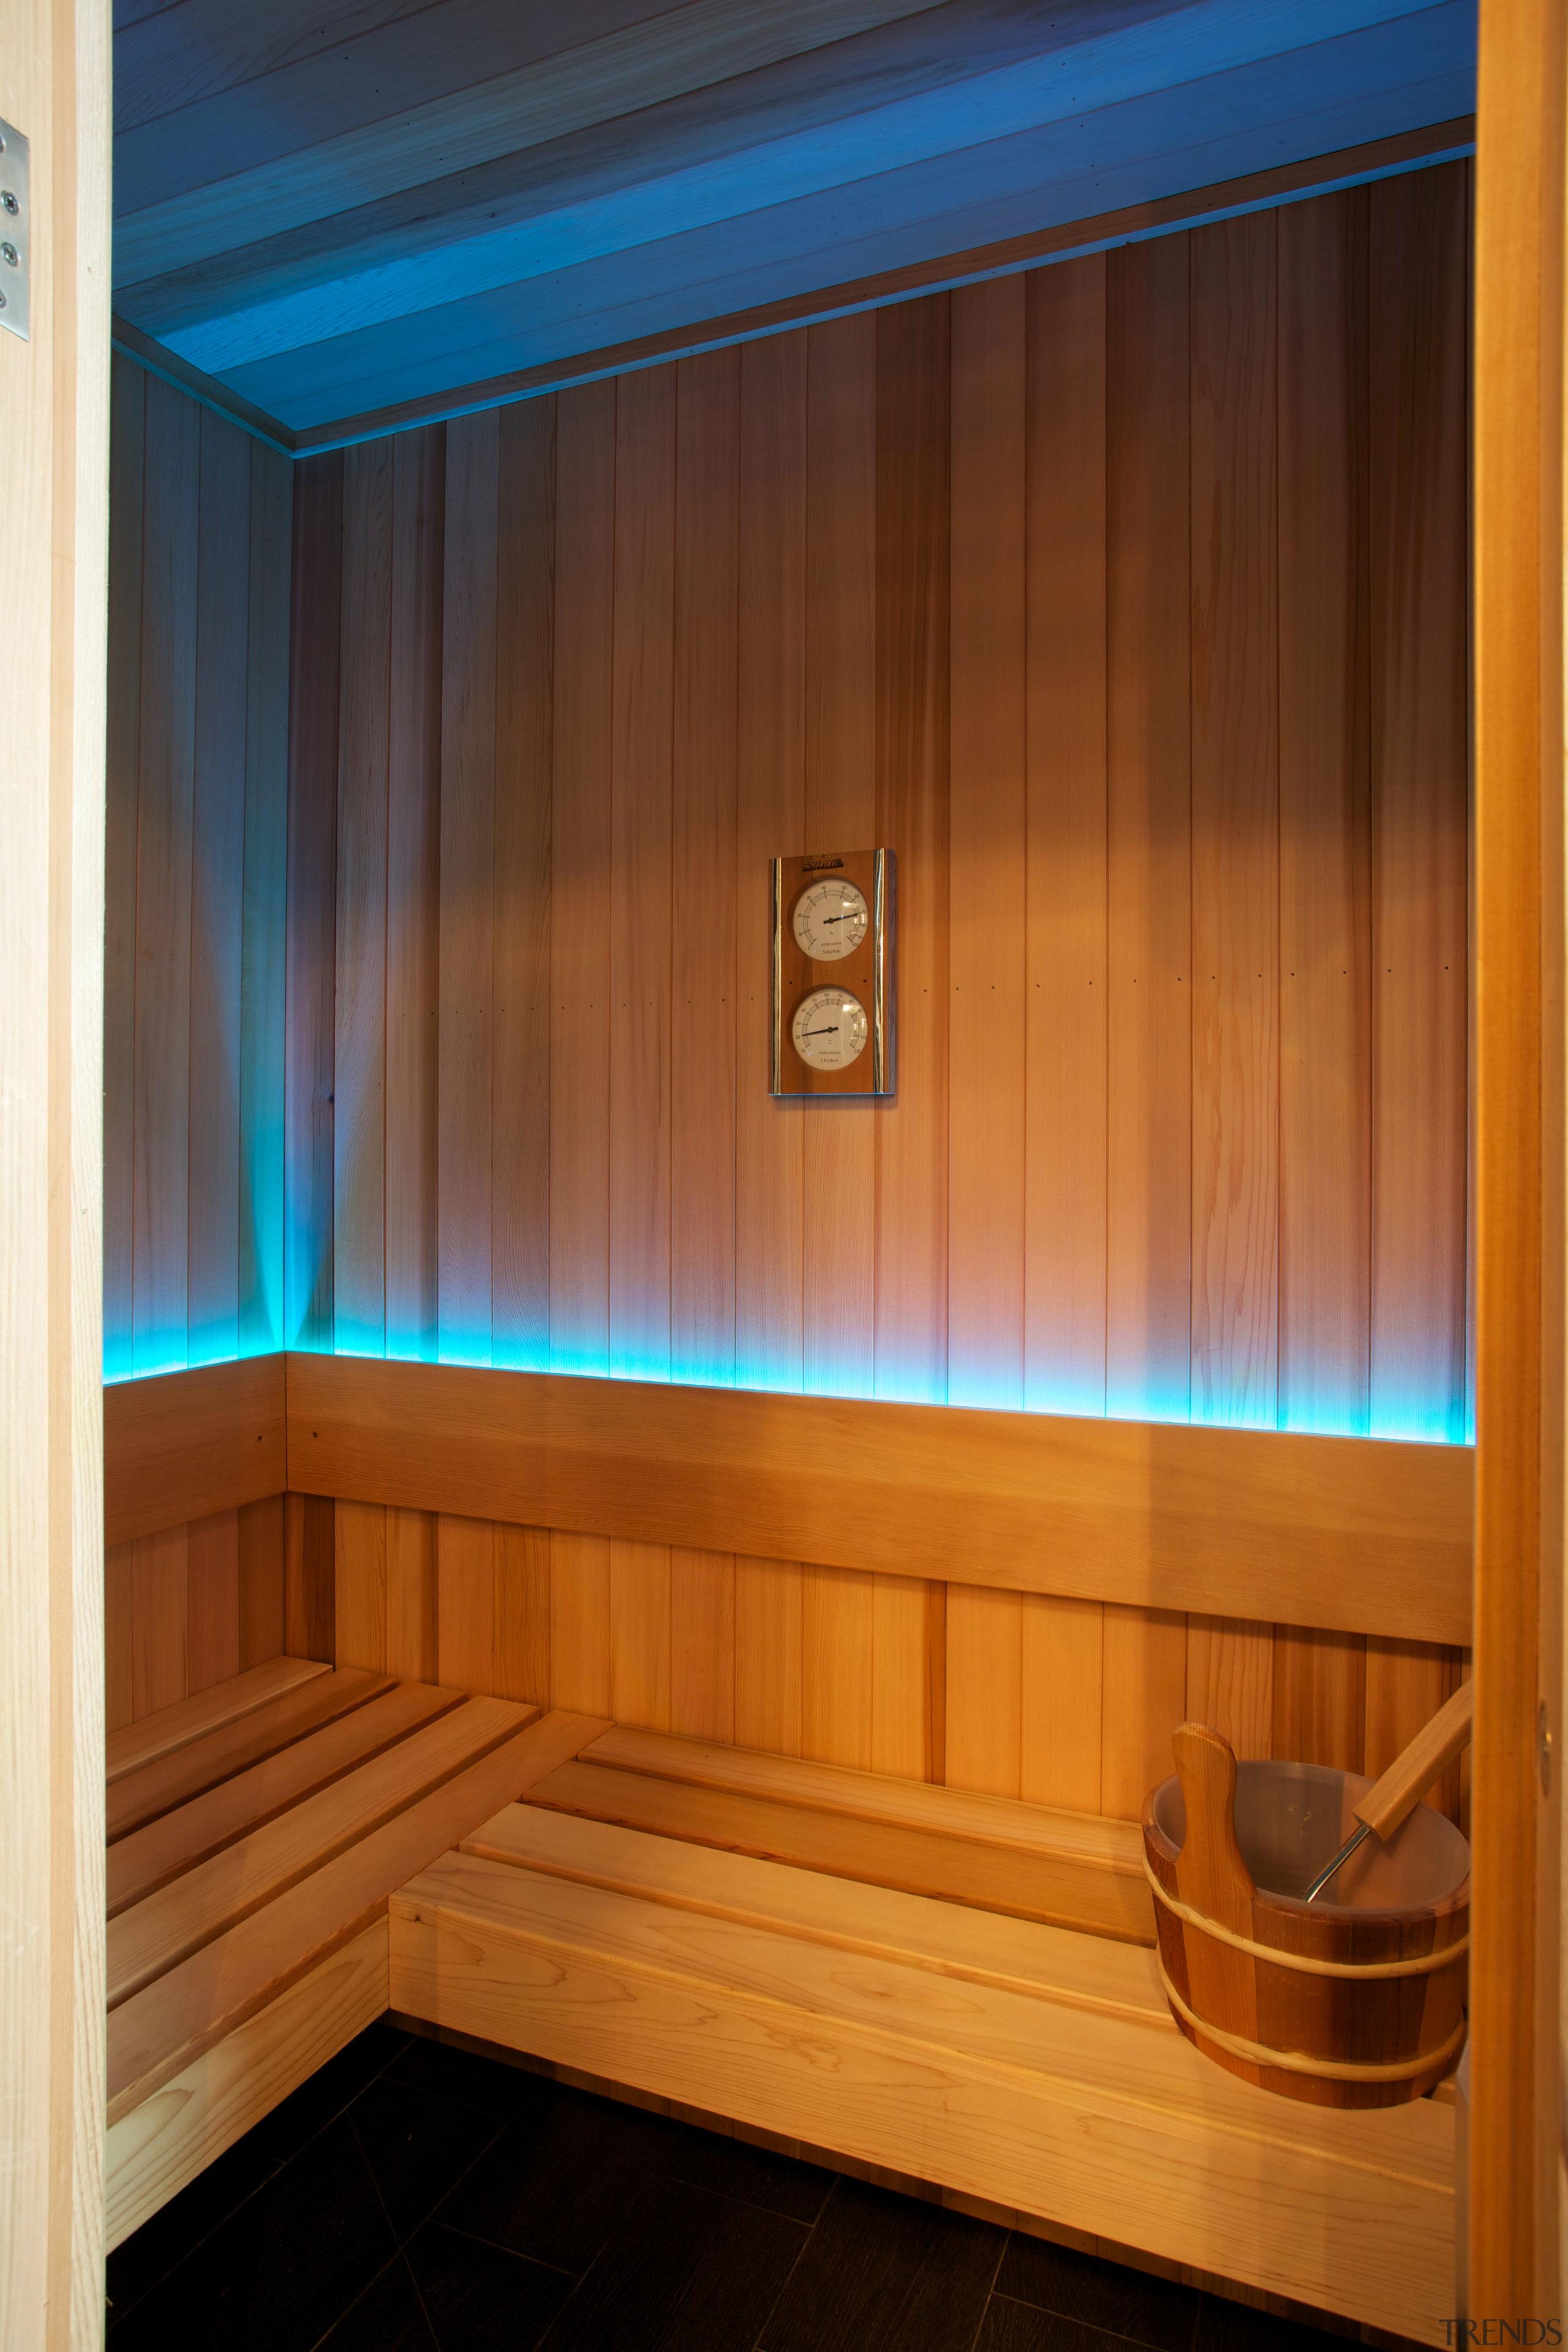 A cedar-lined sauna room, with LED lighting is interior design, lighting, sauna, wood, wood stain, brown